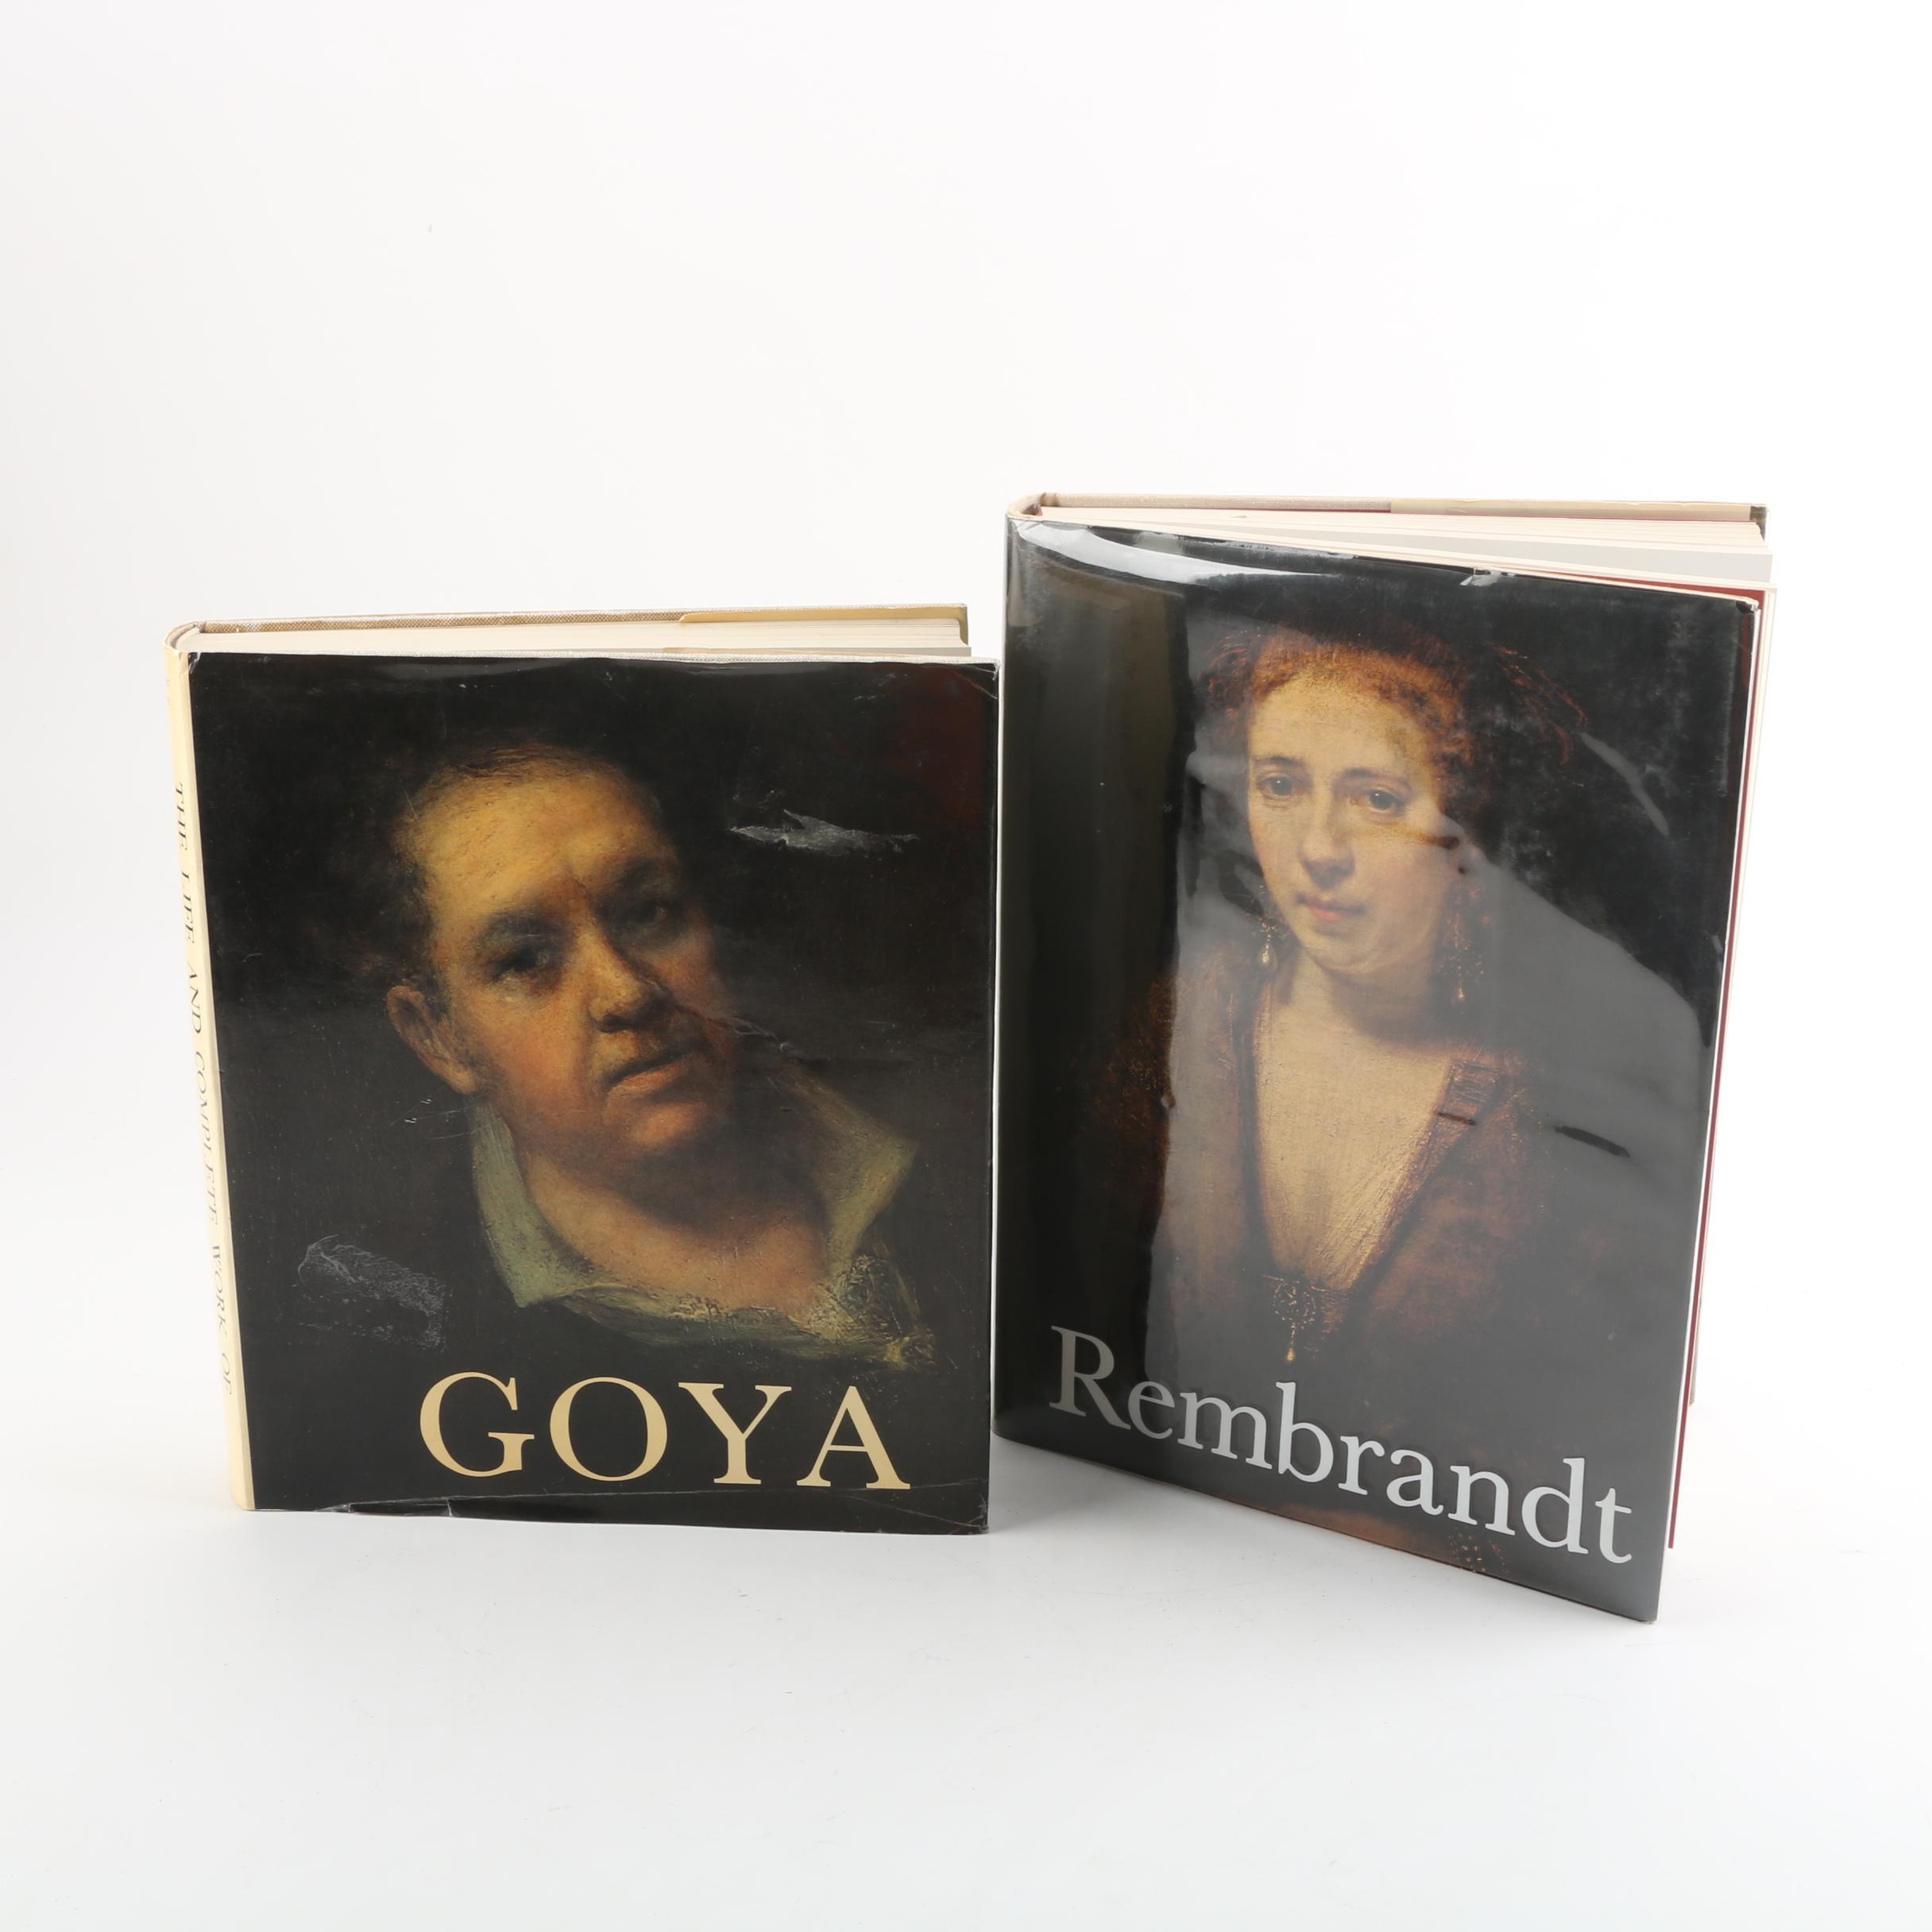 Goya and Rembrandt Art Books